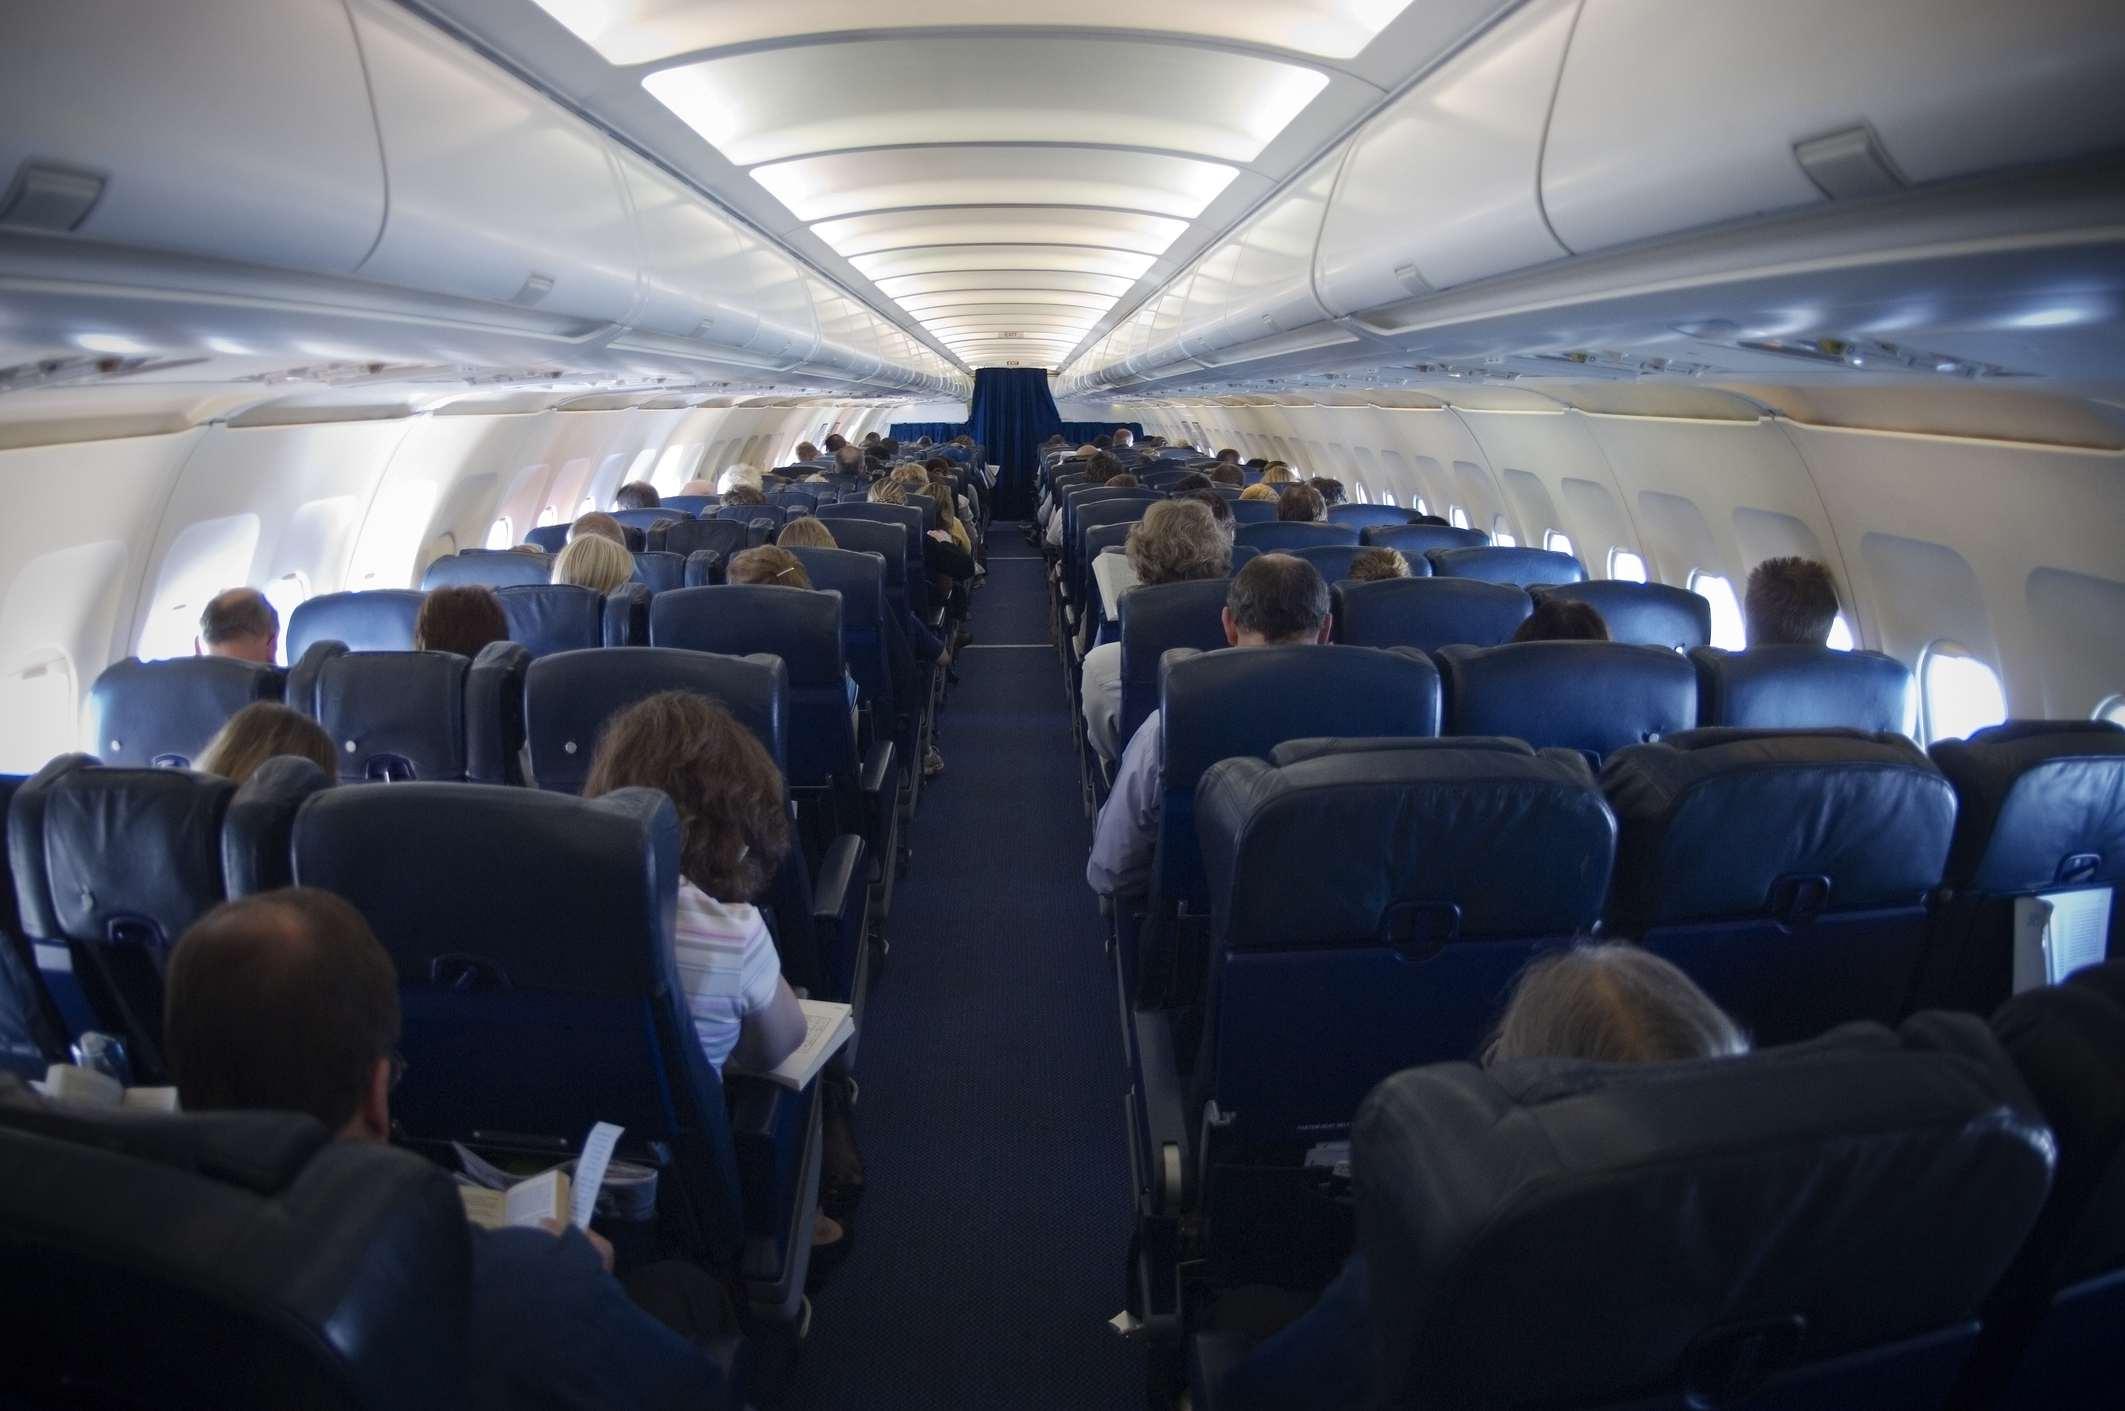 Interior of plane with passengers